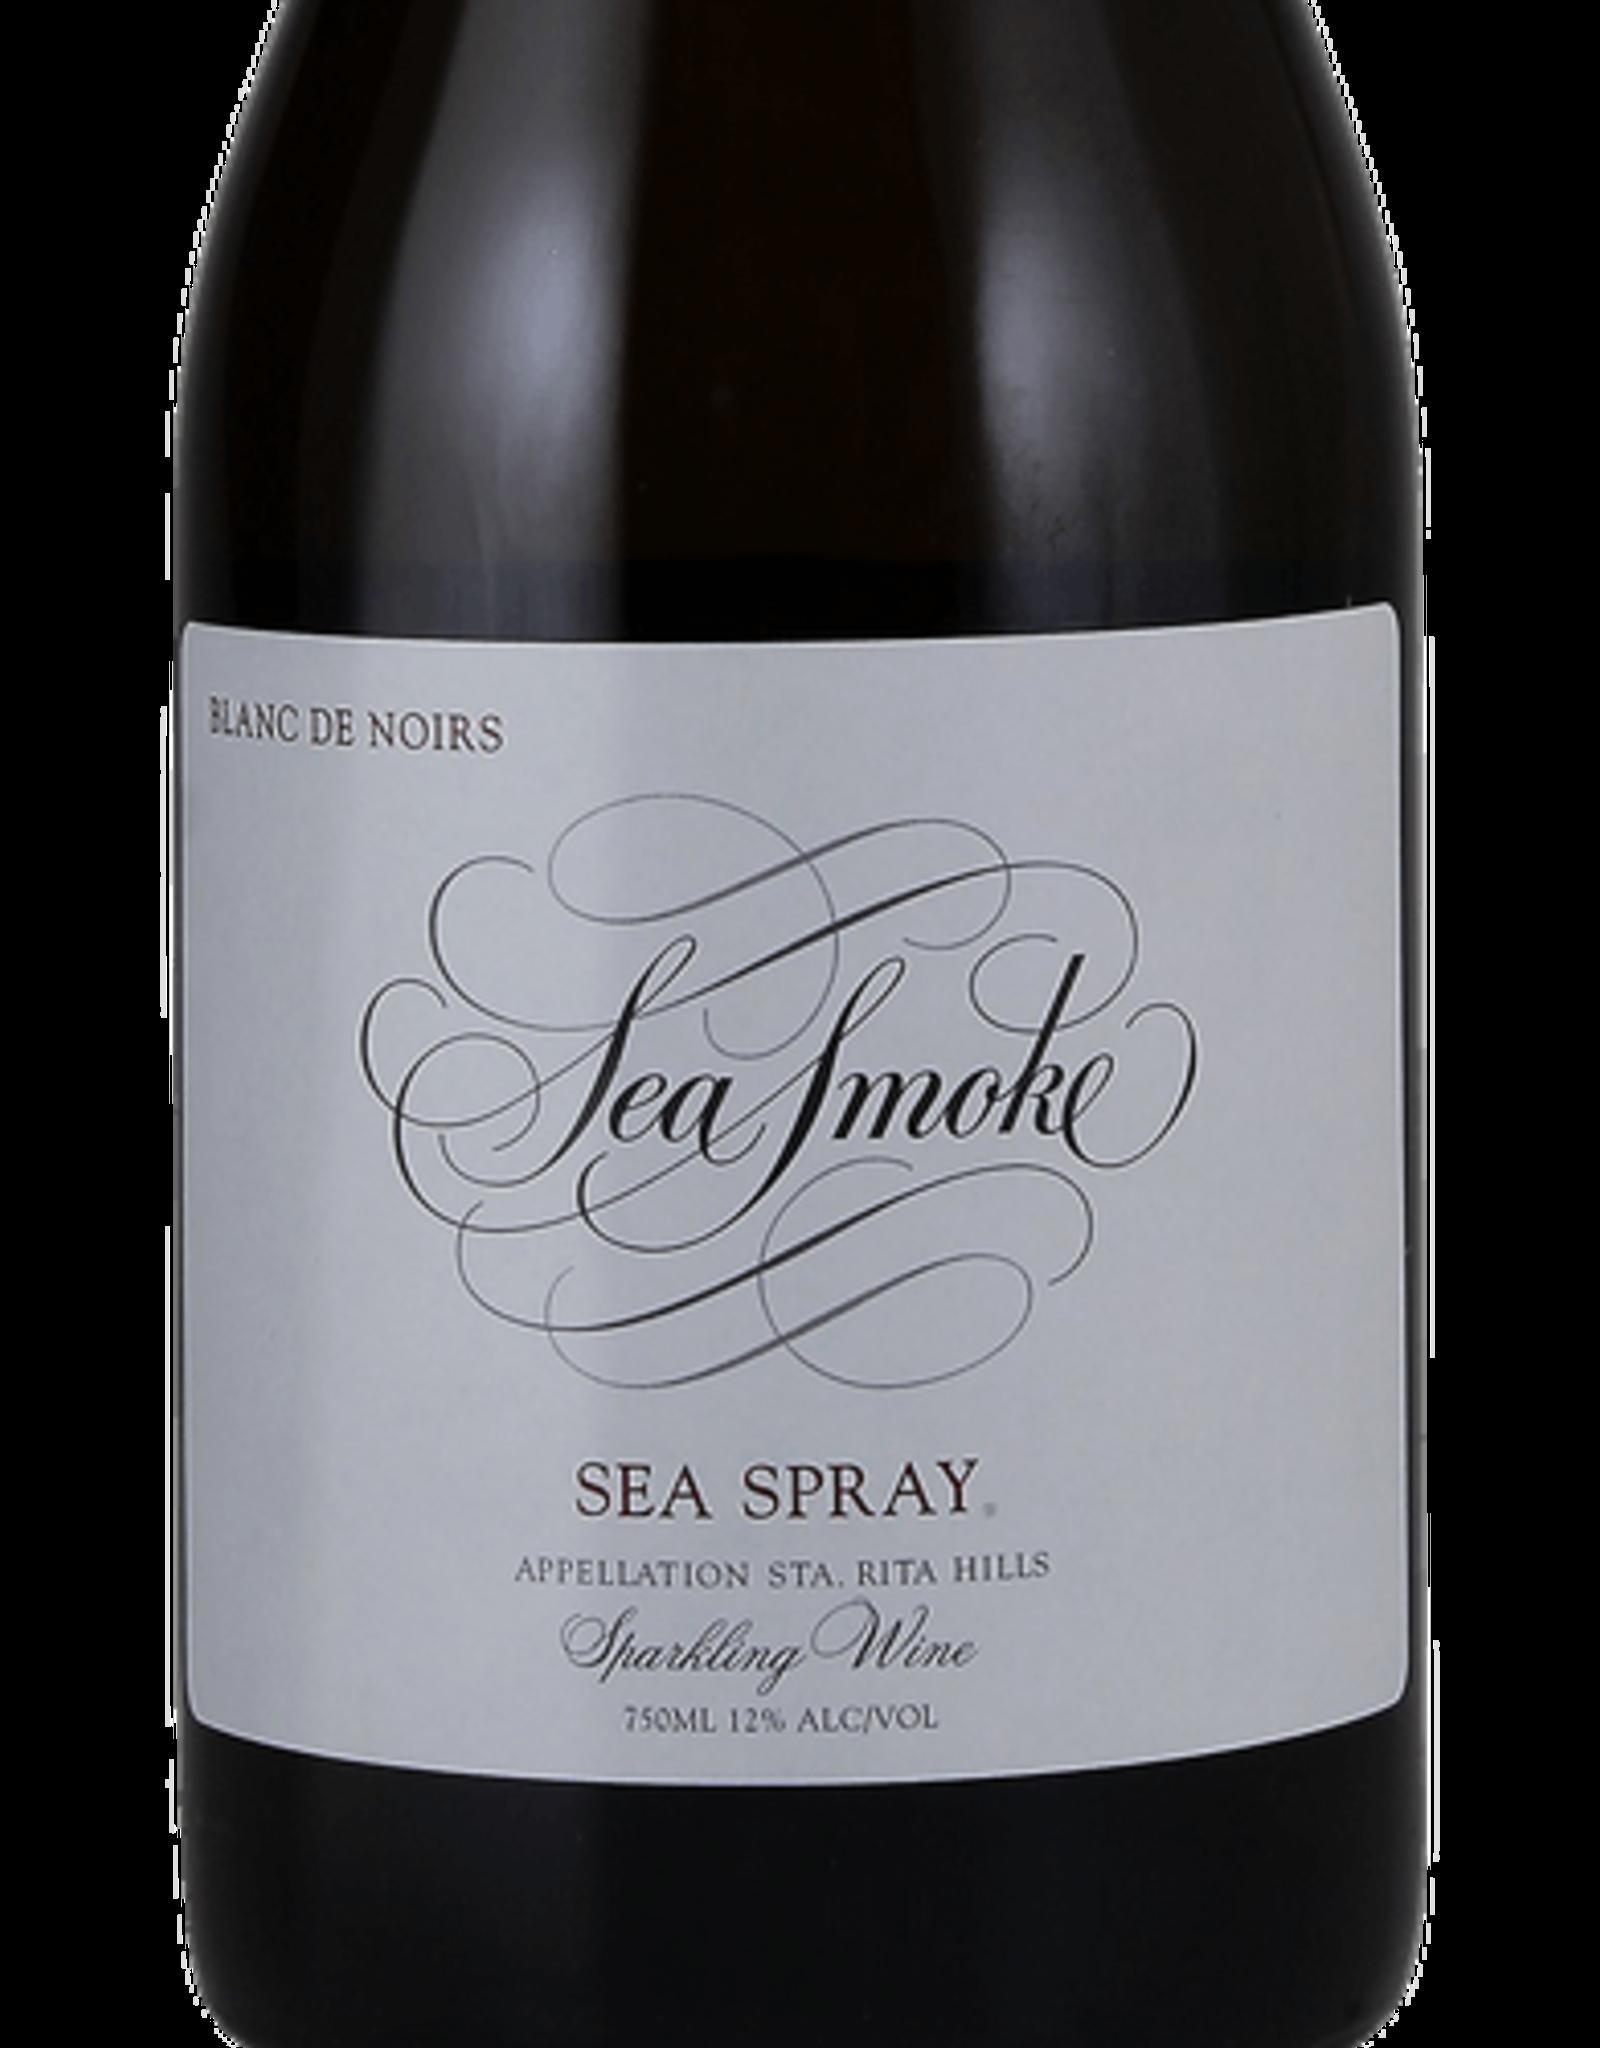 Sea Smoke Sea Spray Blanc de Noirs 2015